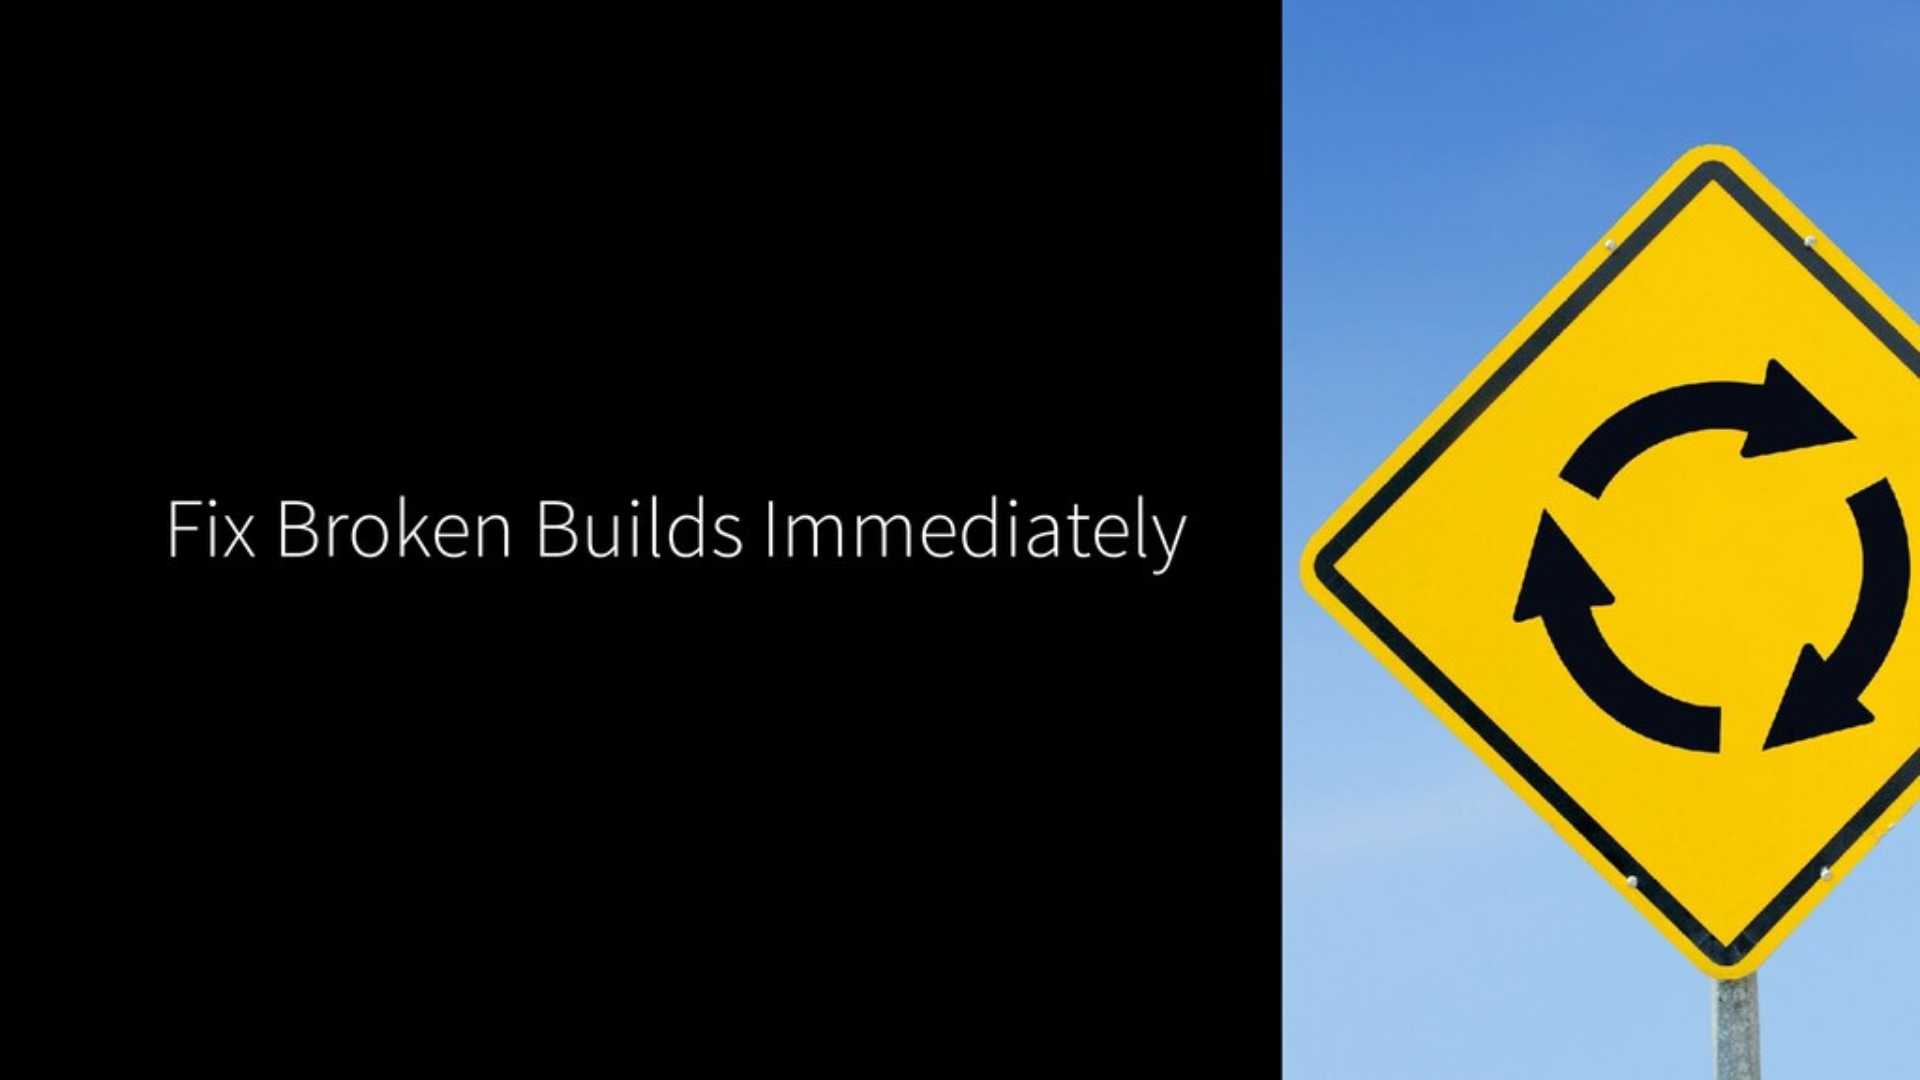 Fix Broken Builds Immediately